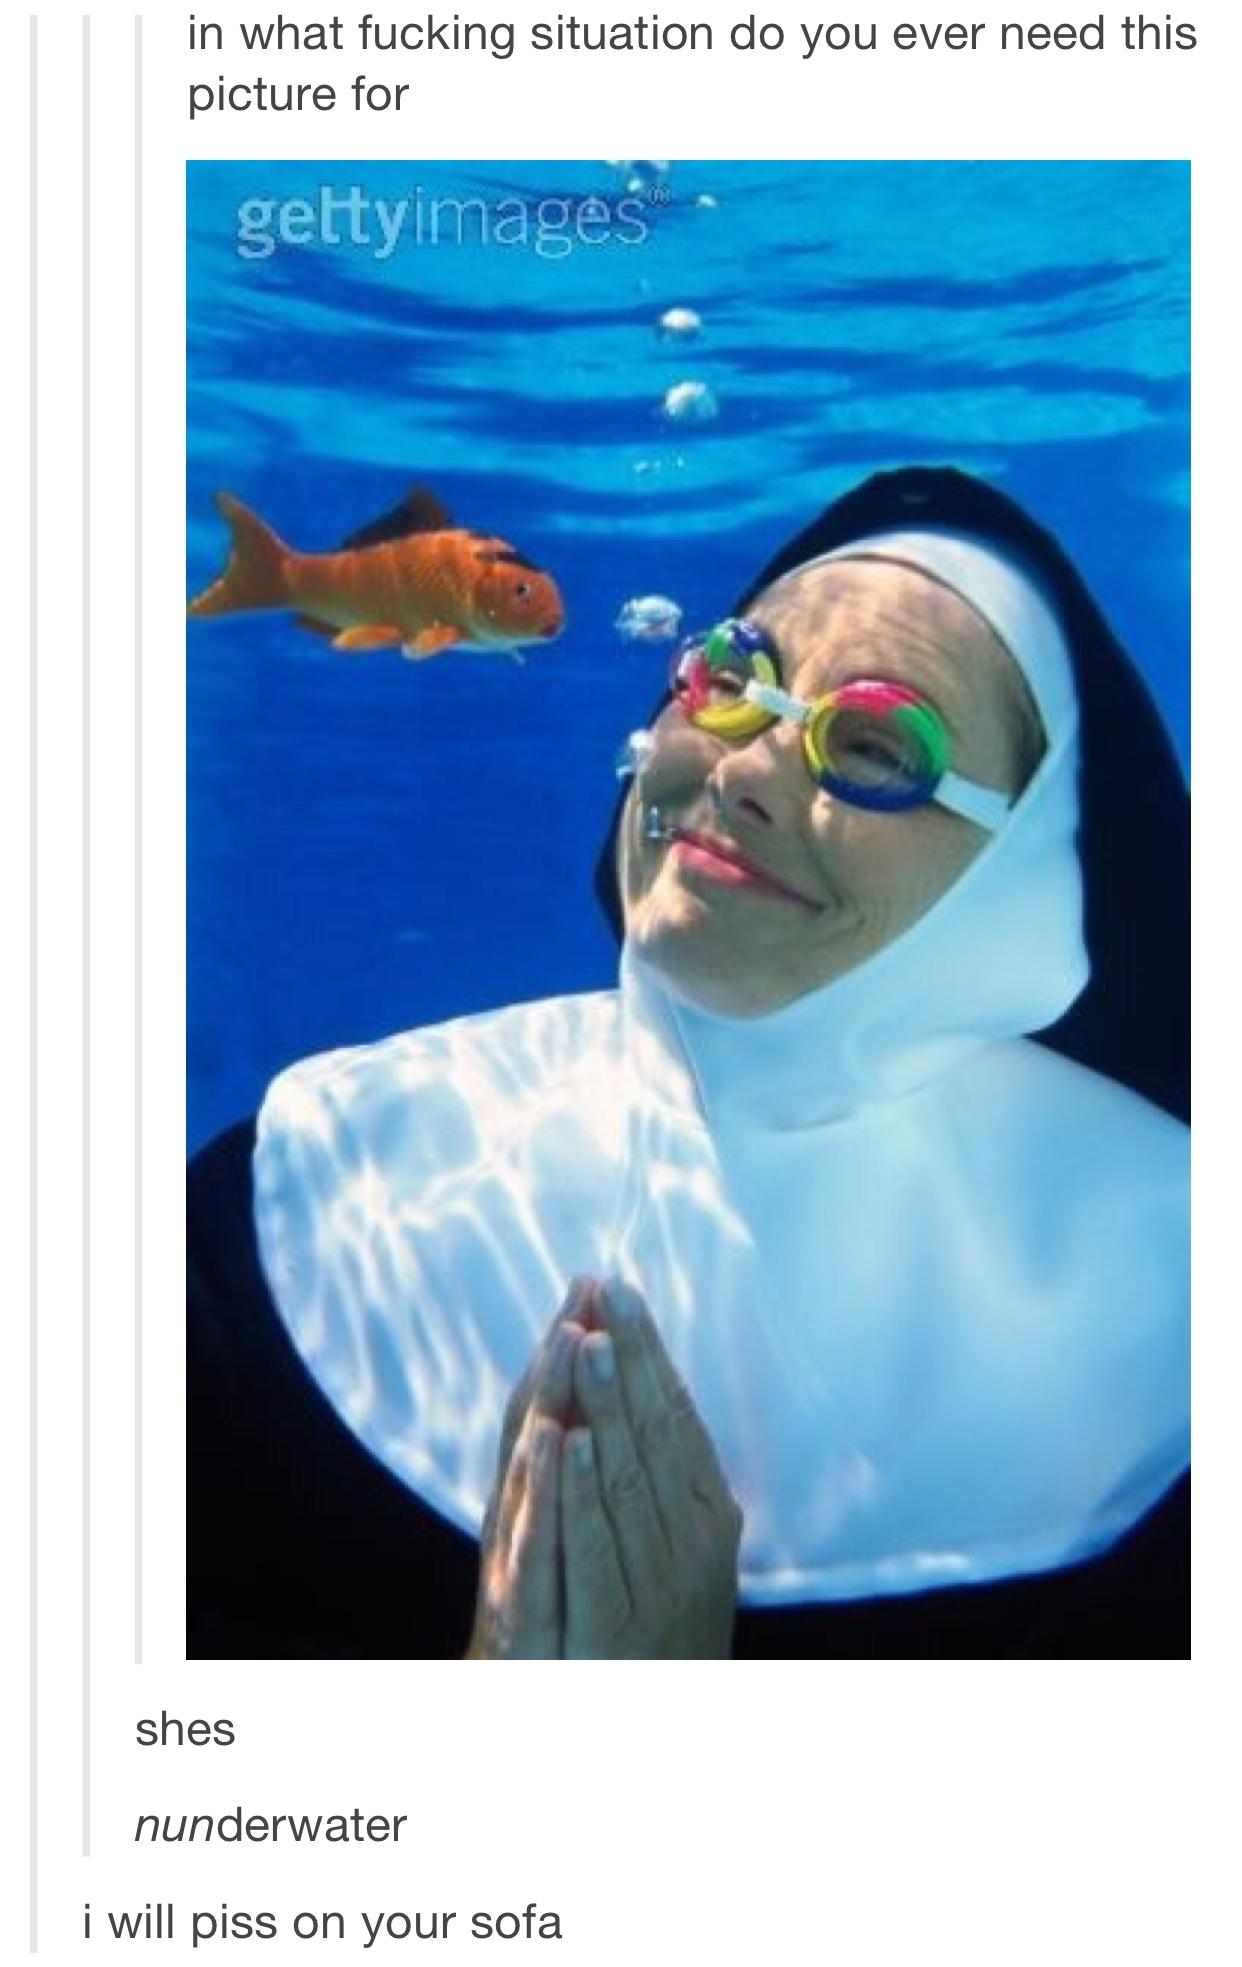 nunderwater - meme